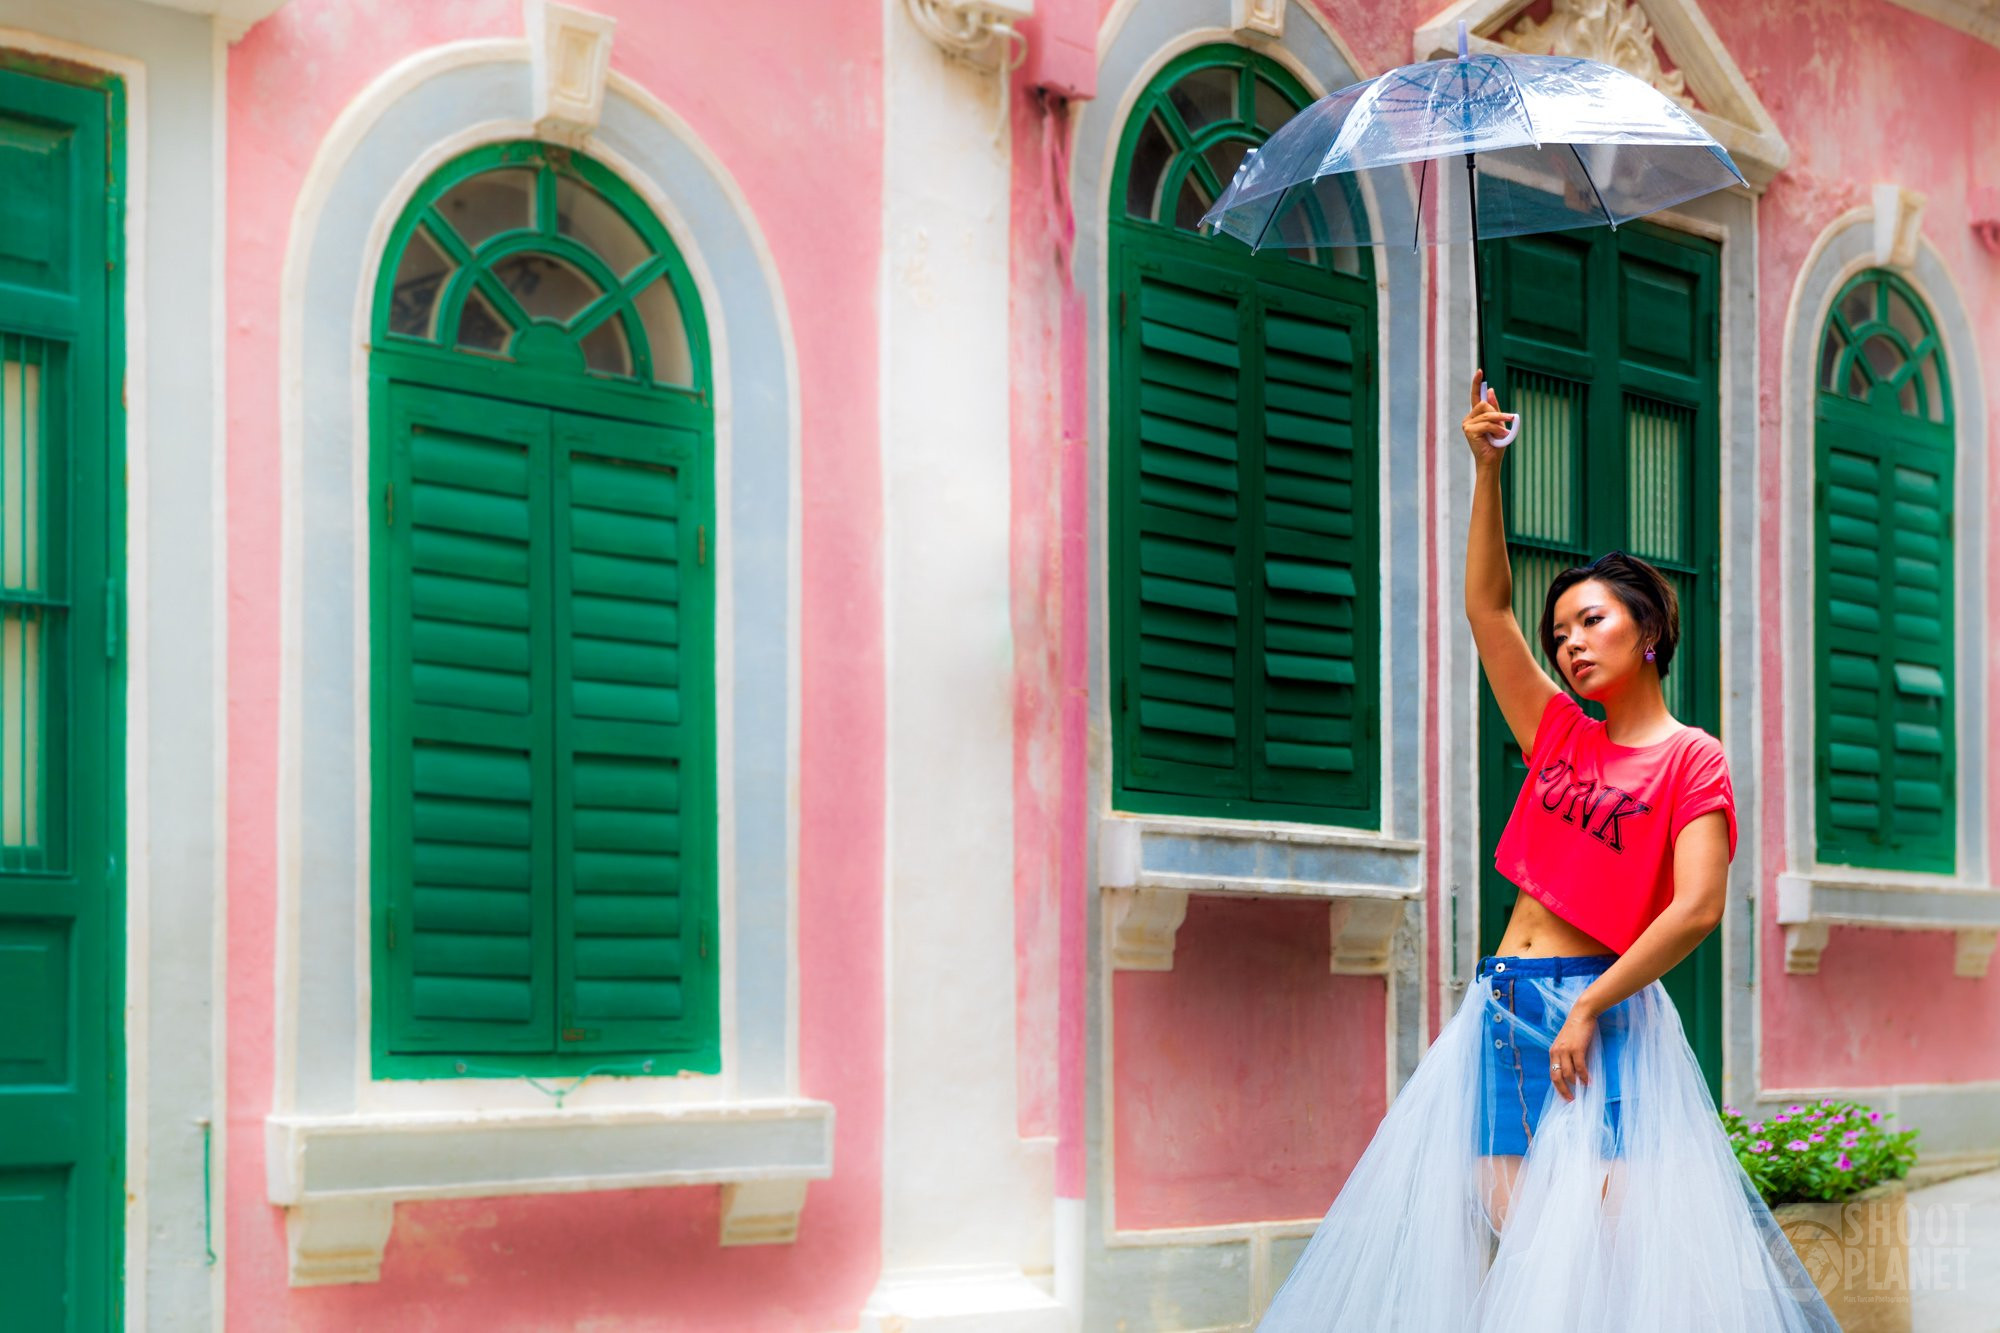 Woman posing Travessa da Paixao, Macao China